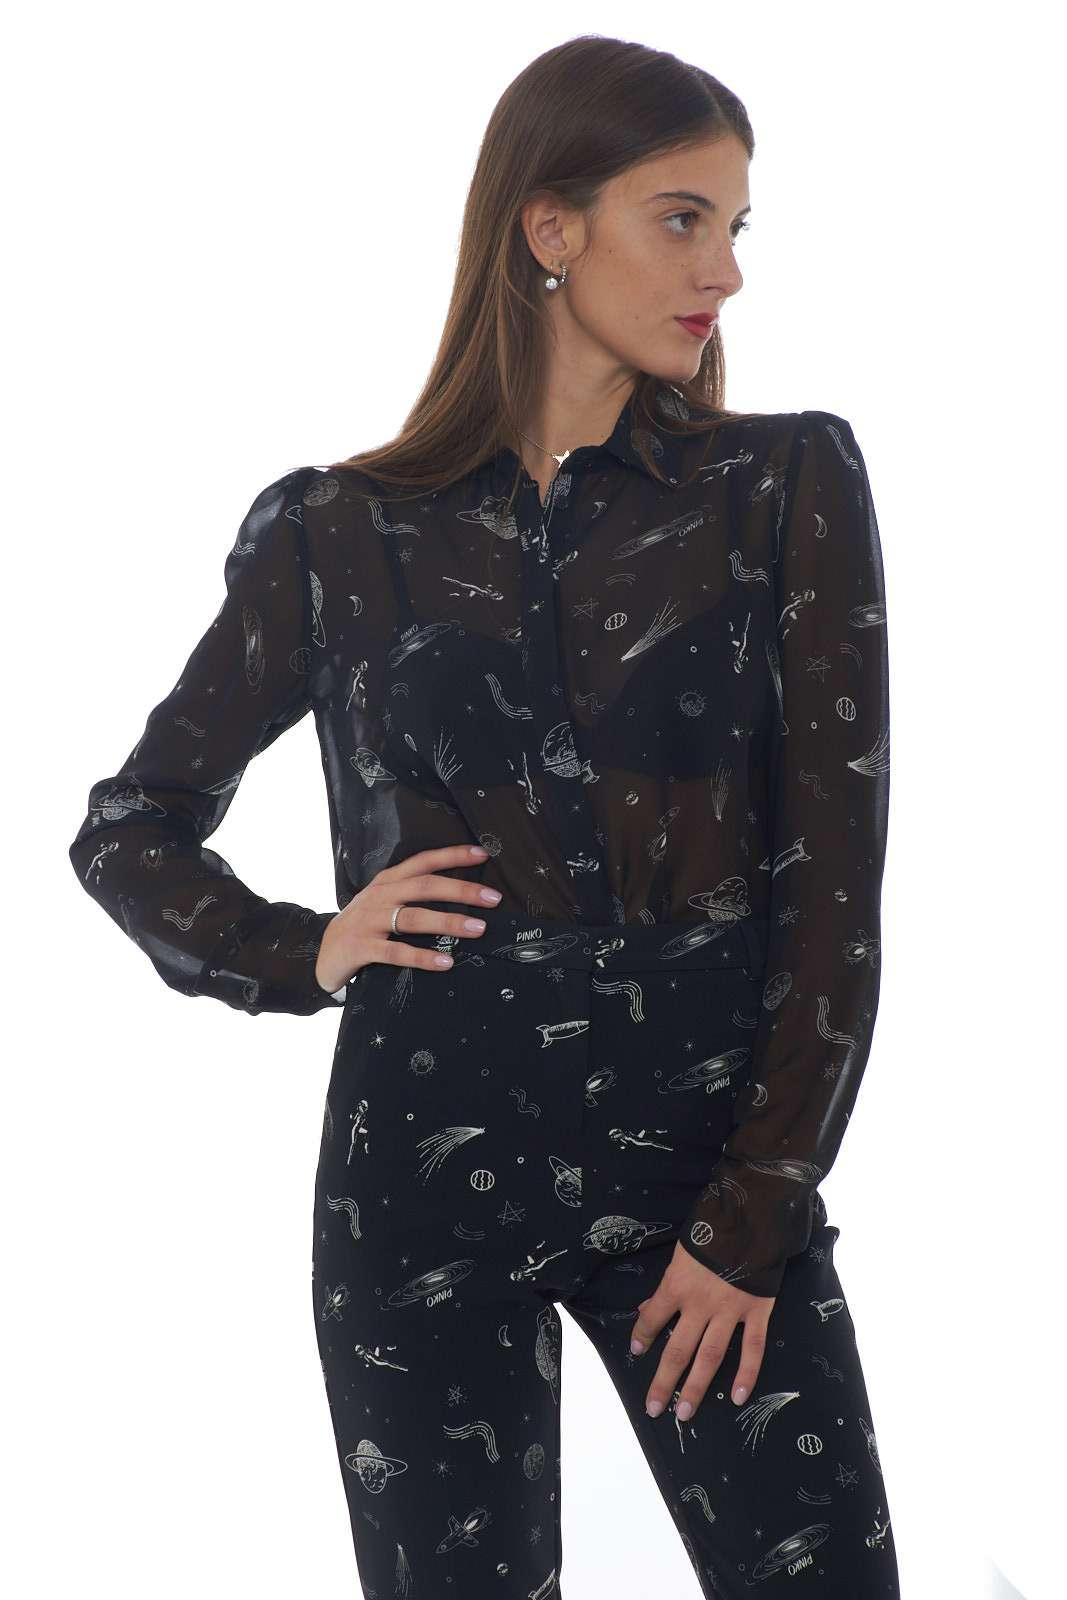 https://www.parmax.com/media/catalog/product/a/i/AI-outlet_parmax-camicia-donna-Pinko-1B145W-A.jpg